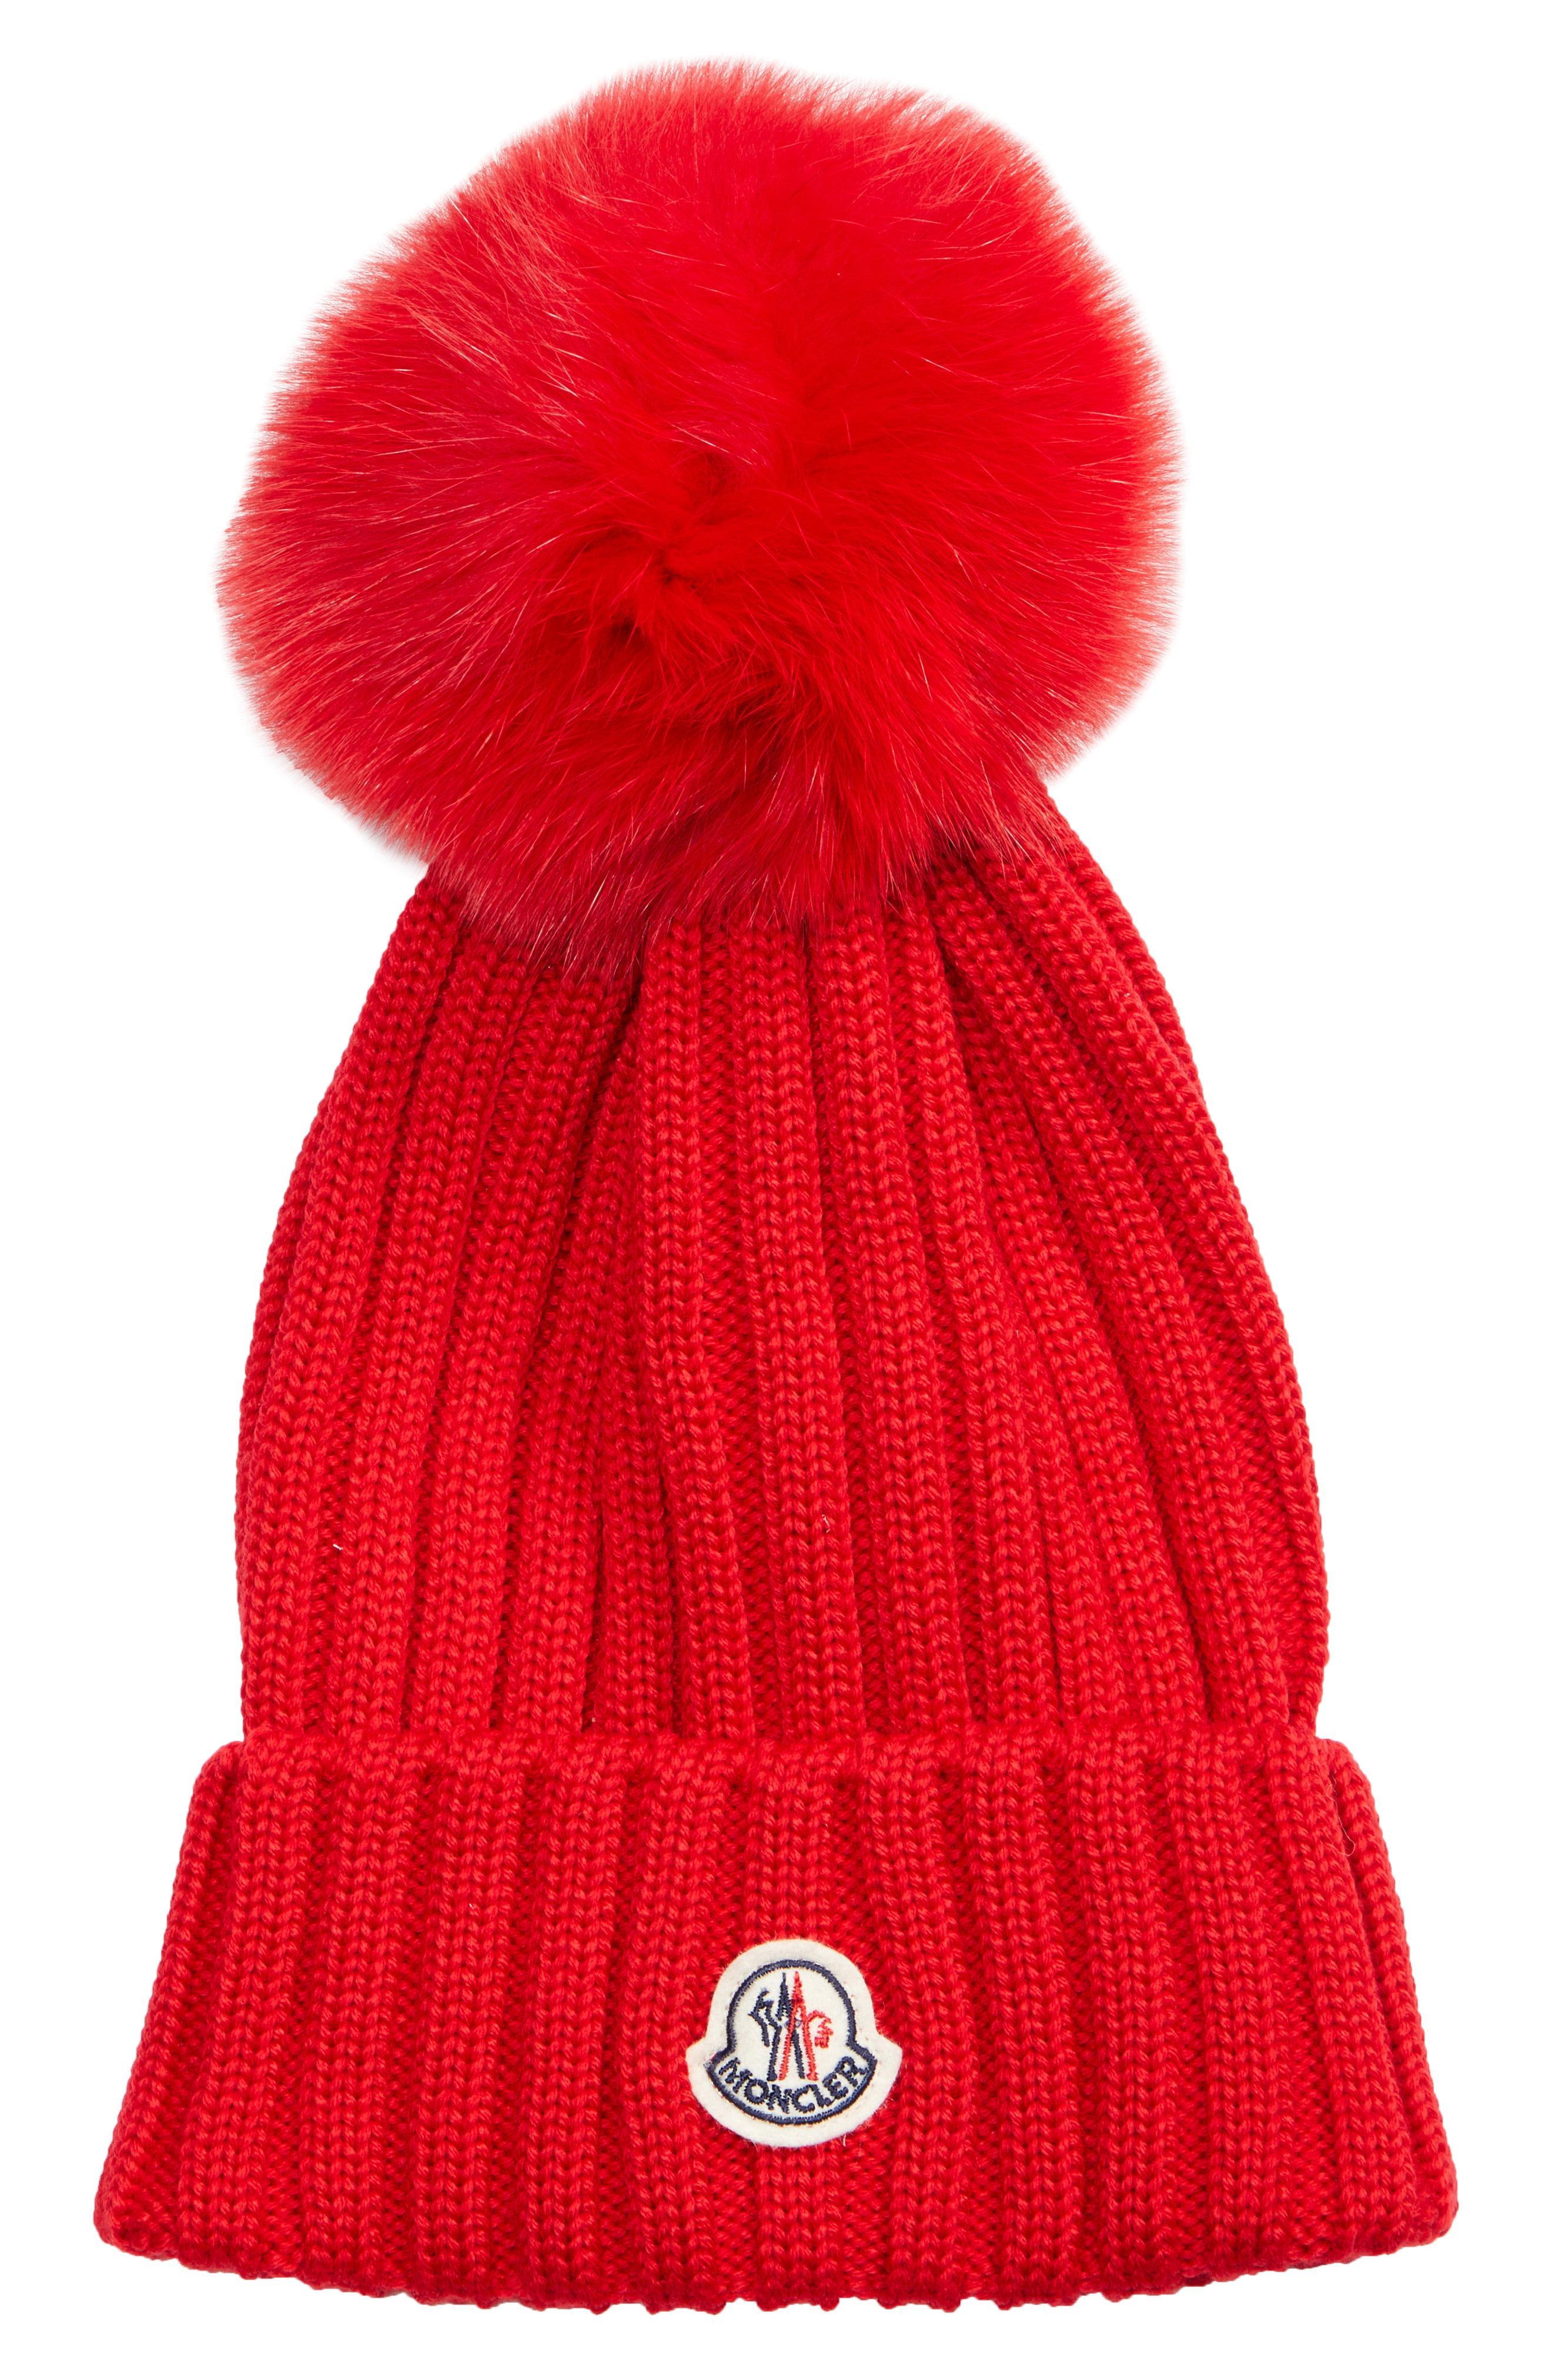 d2209ac6364 Lyst - Moncler Genuine Fox Fur Pom Wool Beanie - in Red - Save 37%